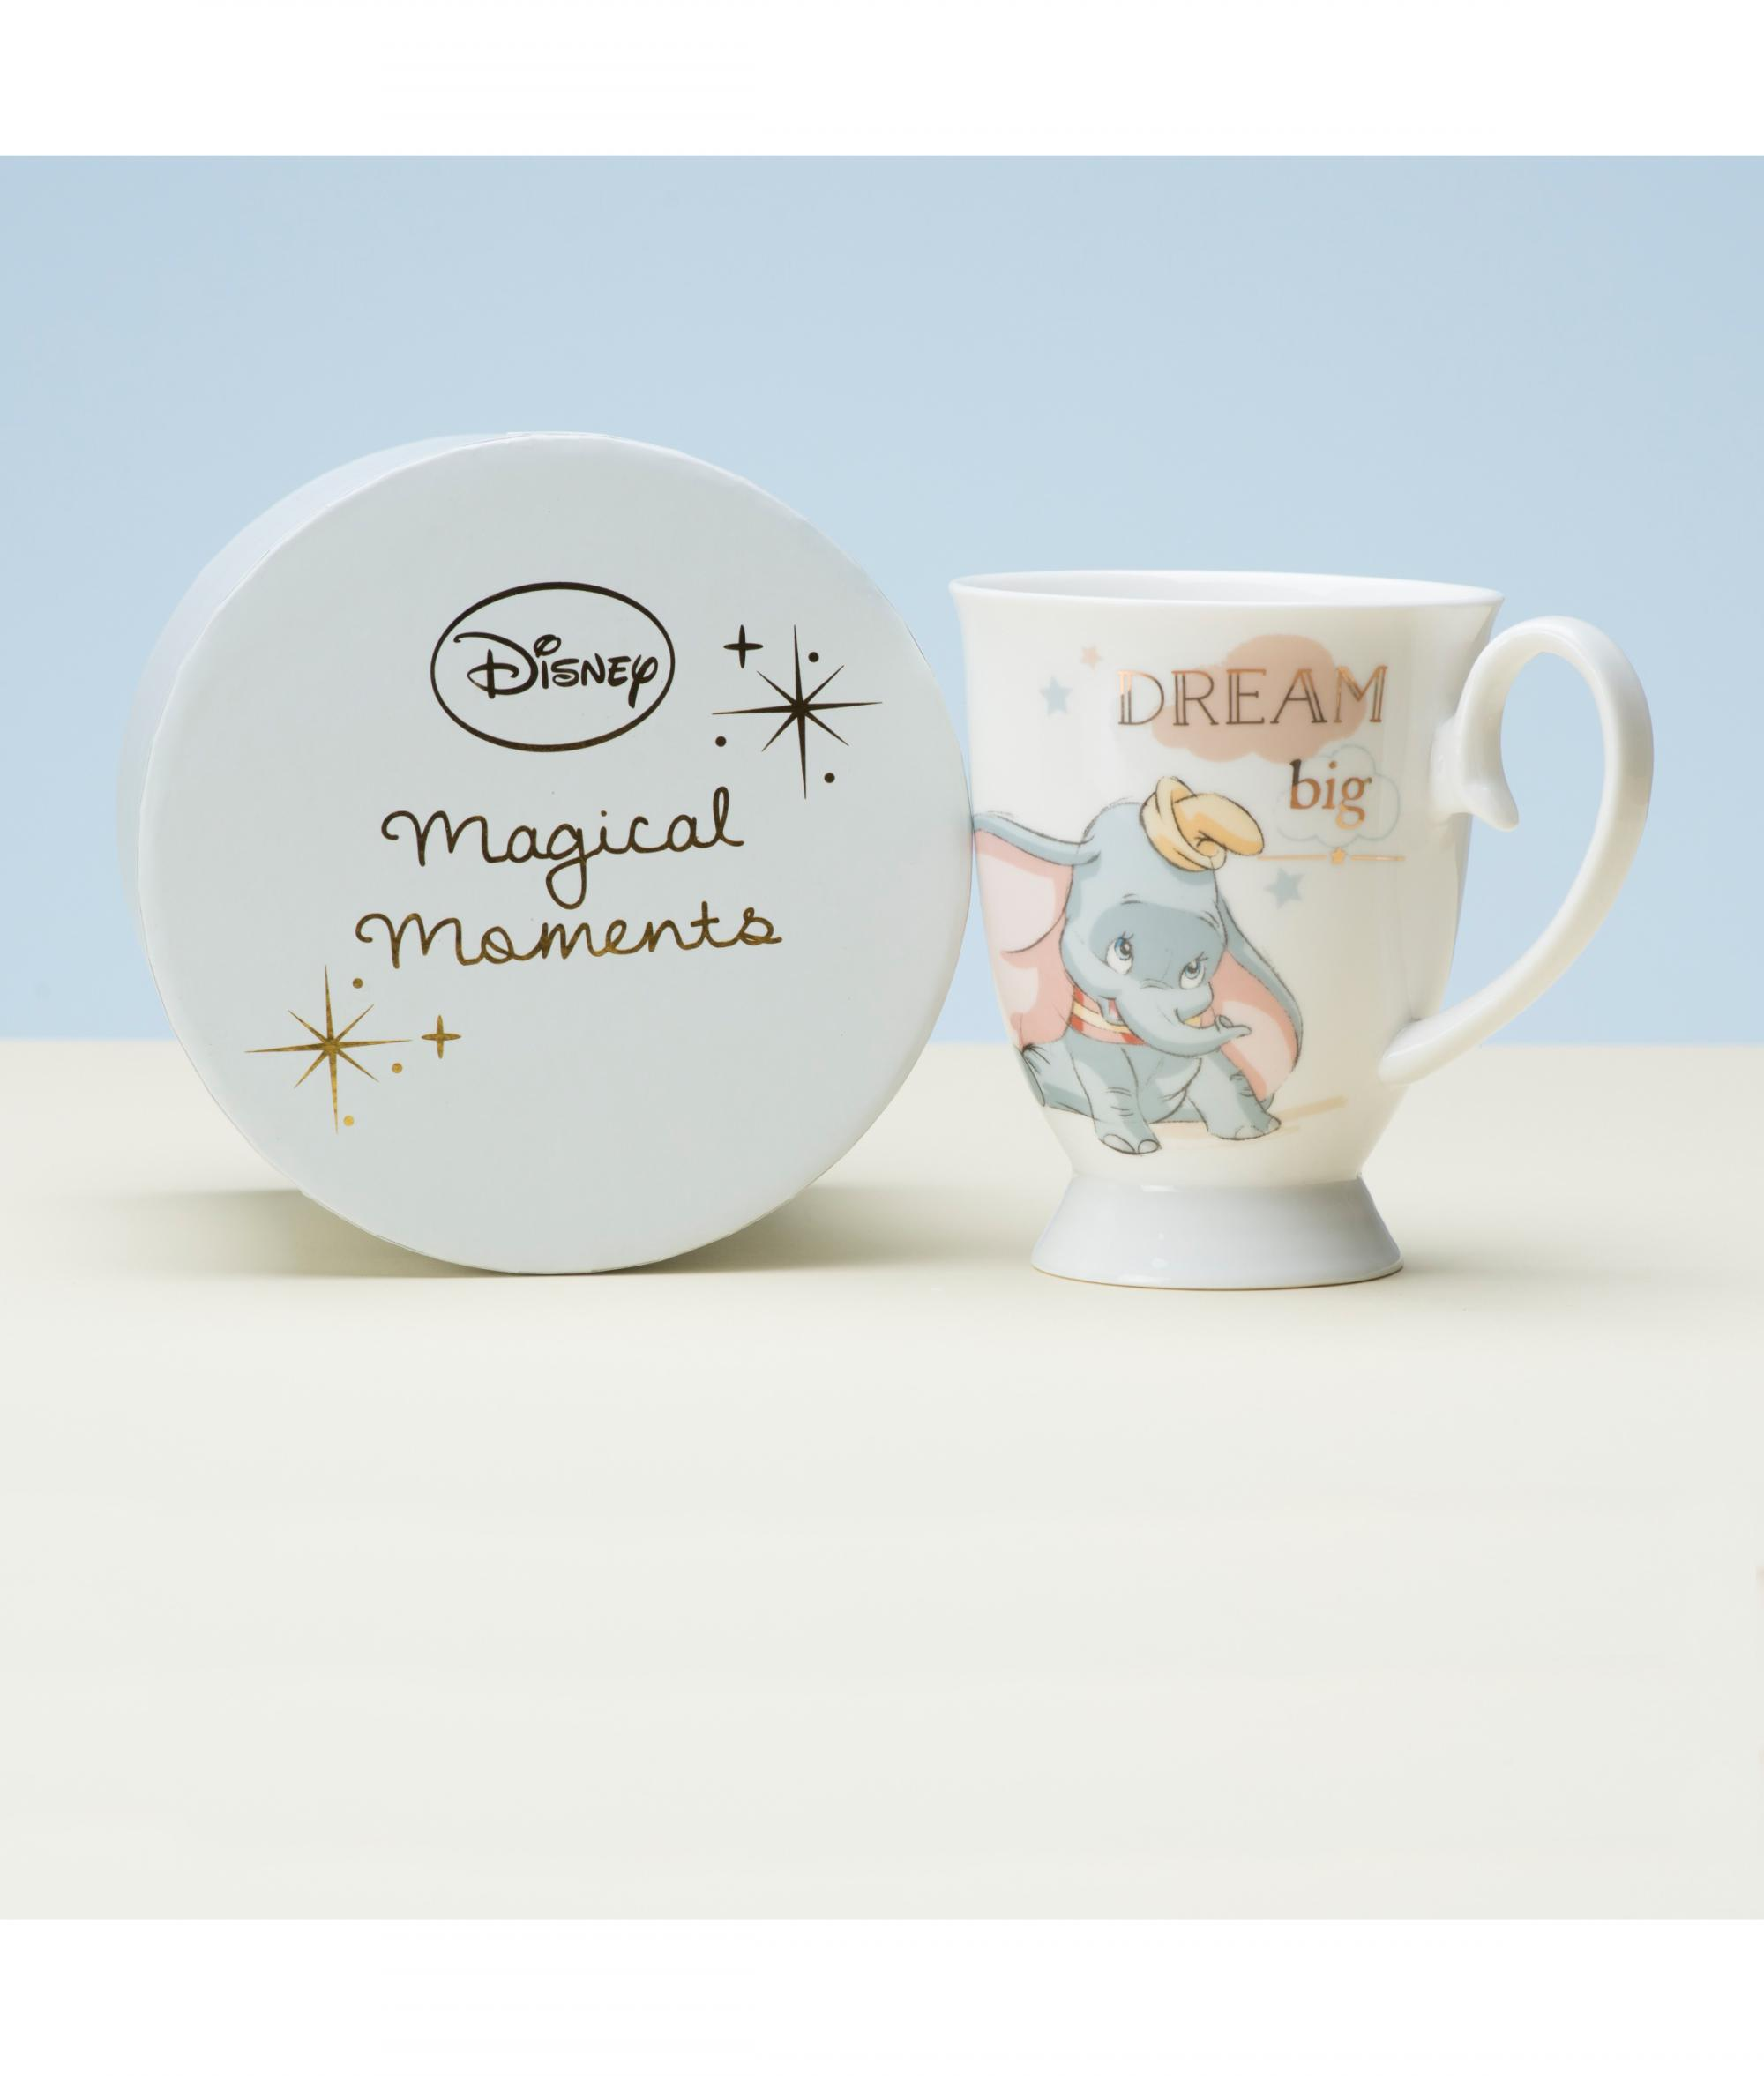 Disney Baby Gifts Uk : Disney magical moments dumbo dream big mug